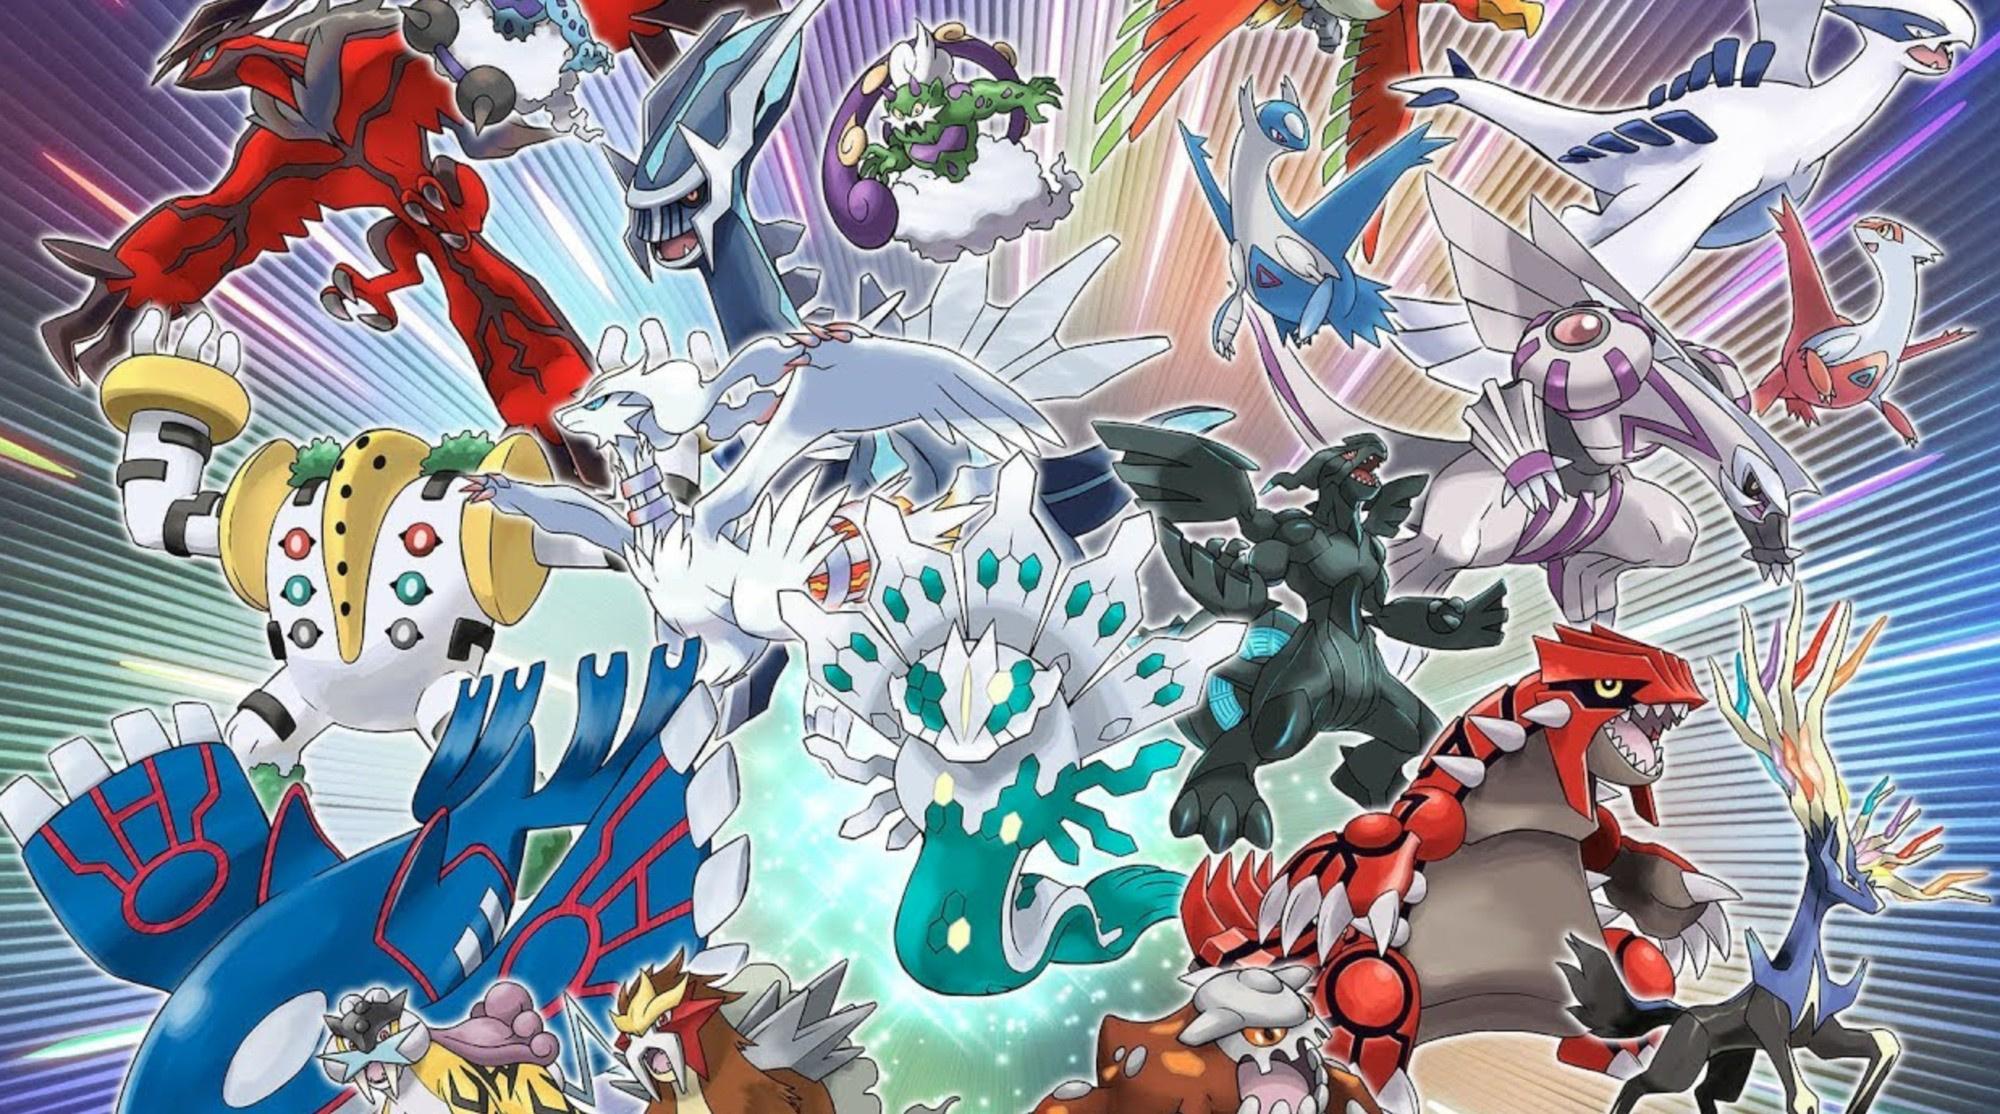 A Pokémon Retrospective: Generation 7 - 2016 To 2019 - Feature